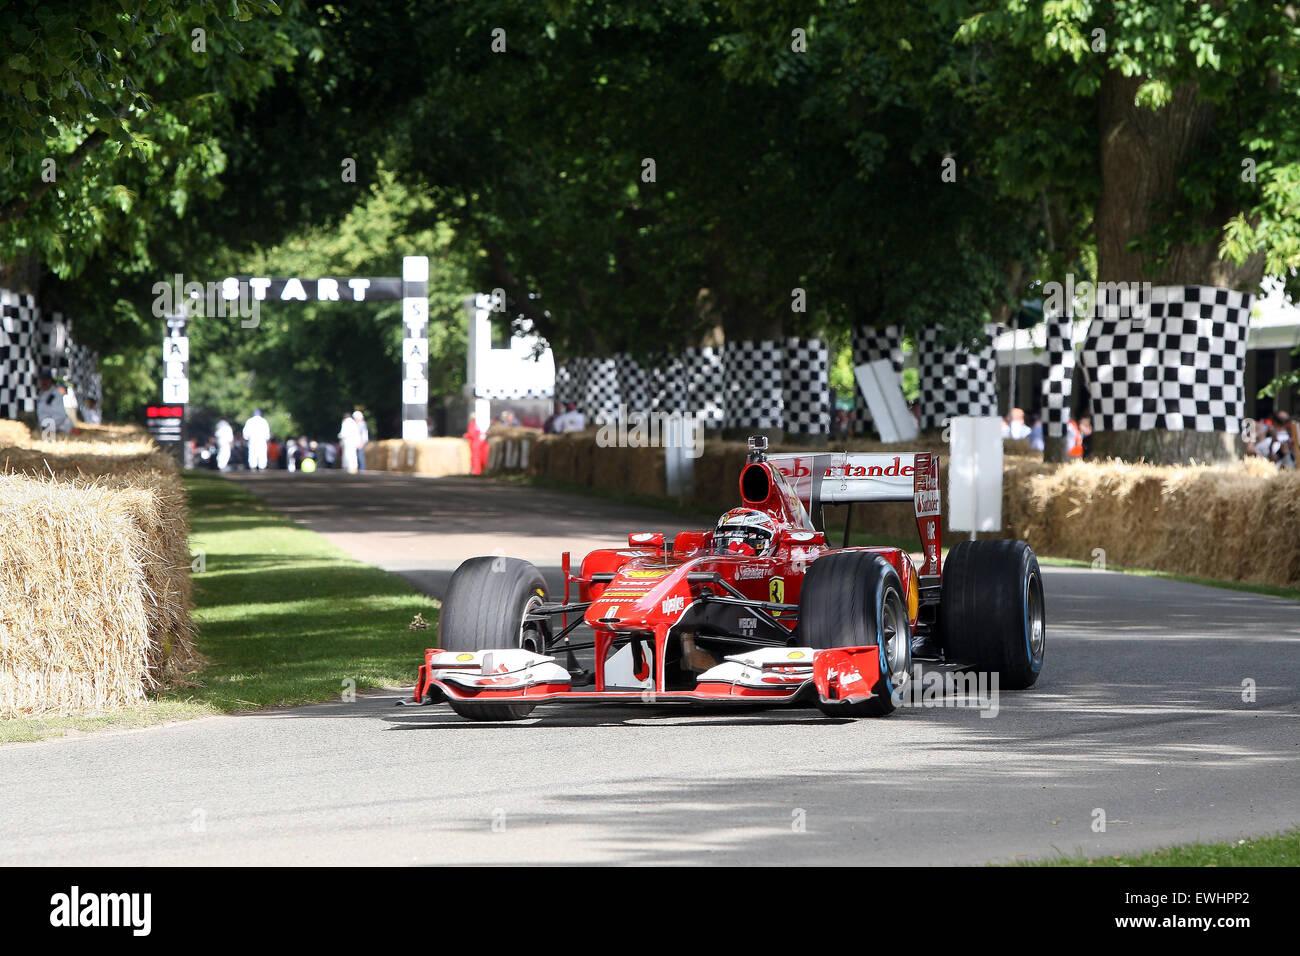 Goodwood, West Sussex, UK. 26. Juni 2015. Kimi Ferrari FI Auto verlässt die Strecke beim Goodwood Festival Stockbild